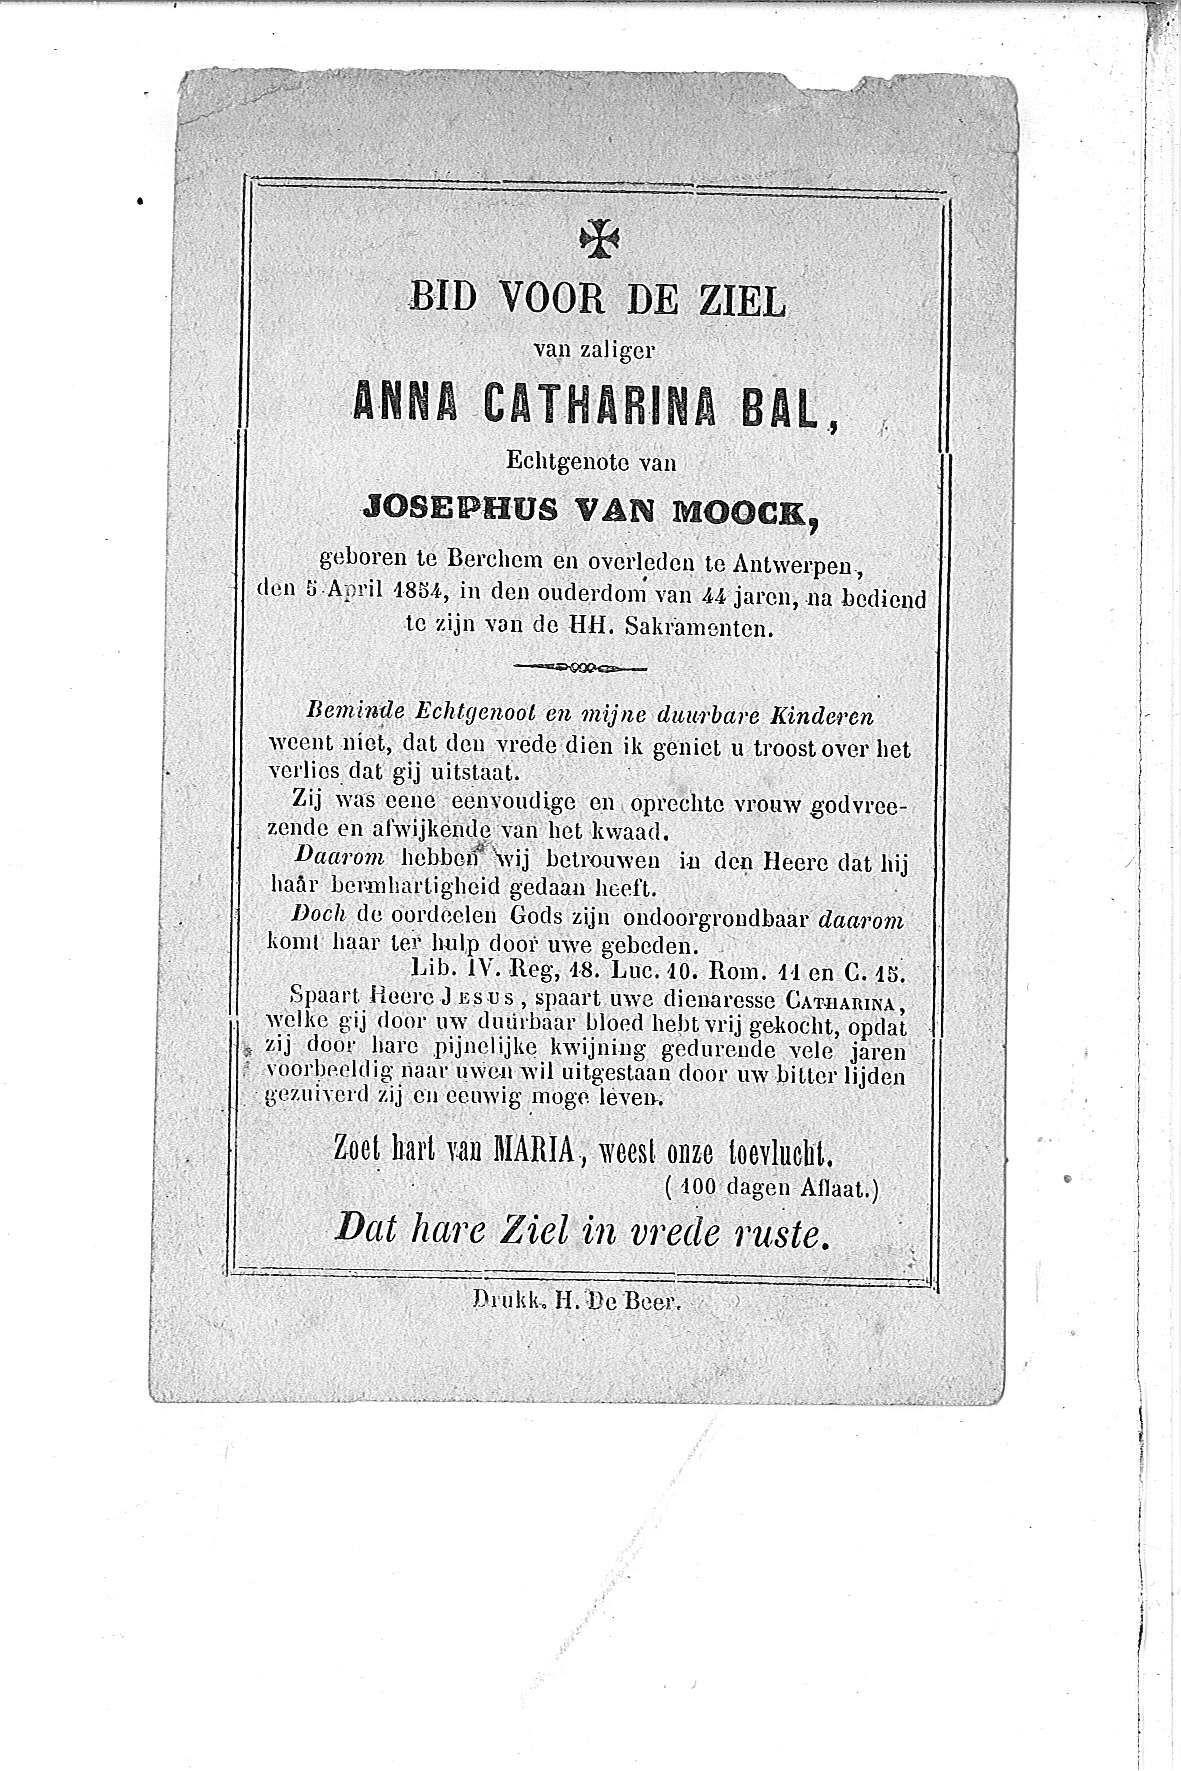 Anna-Catharina(1854)20101006133005_00018.jpg